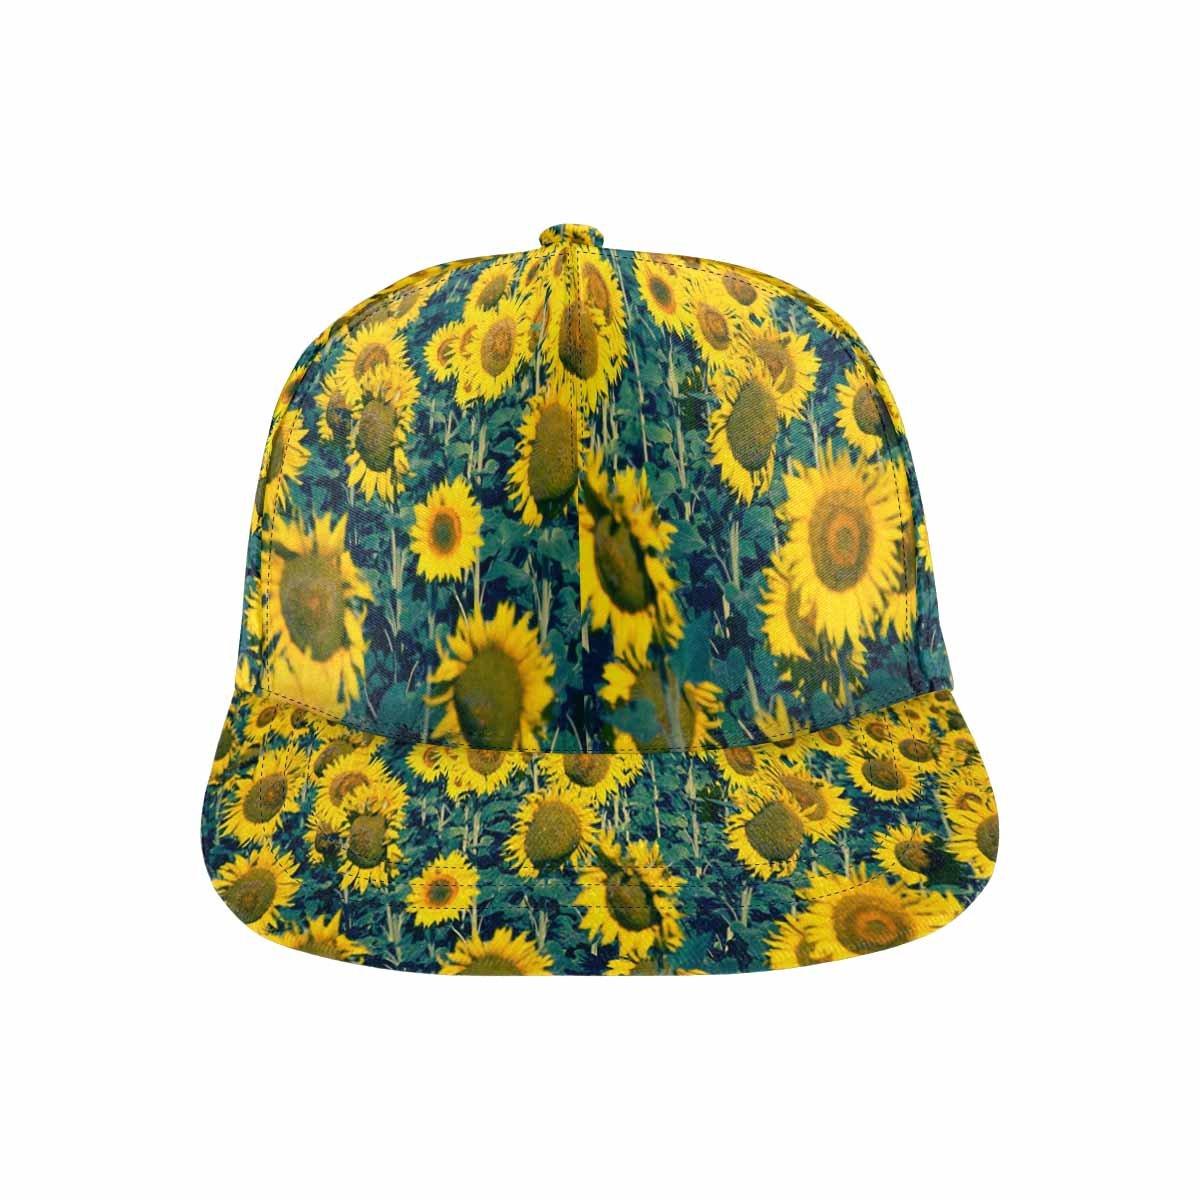 InterestPrint Funny Designed Adjustable Baseball Caps Dancing Hip Hop Cap